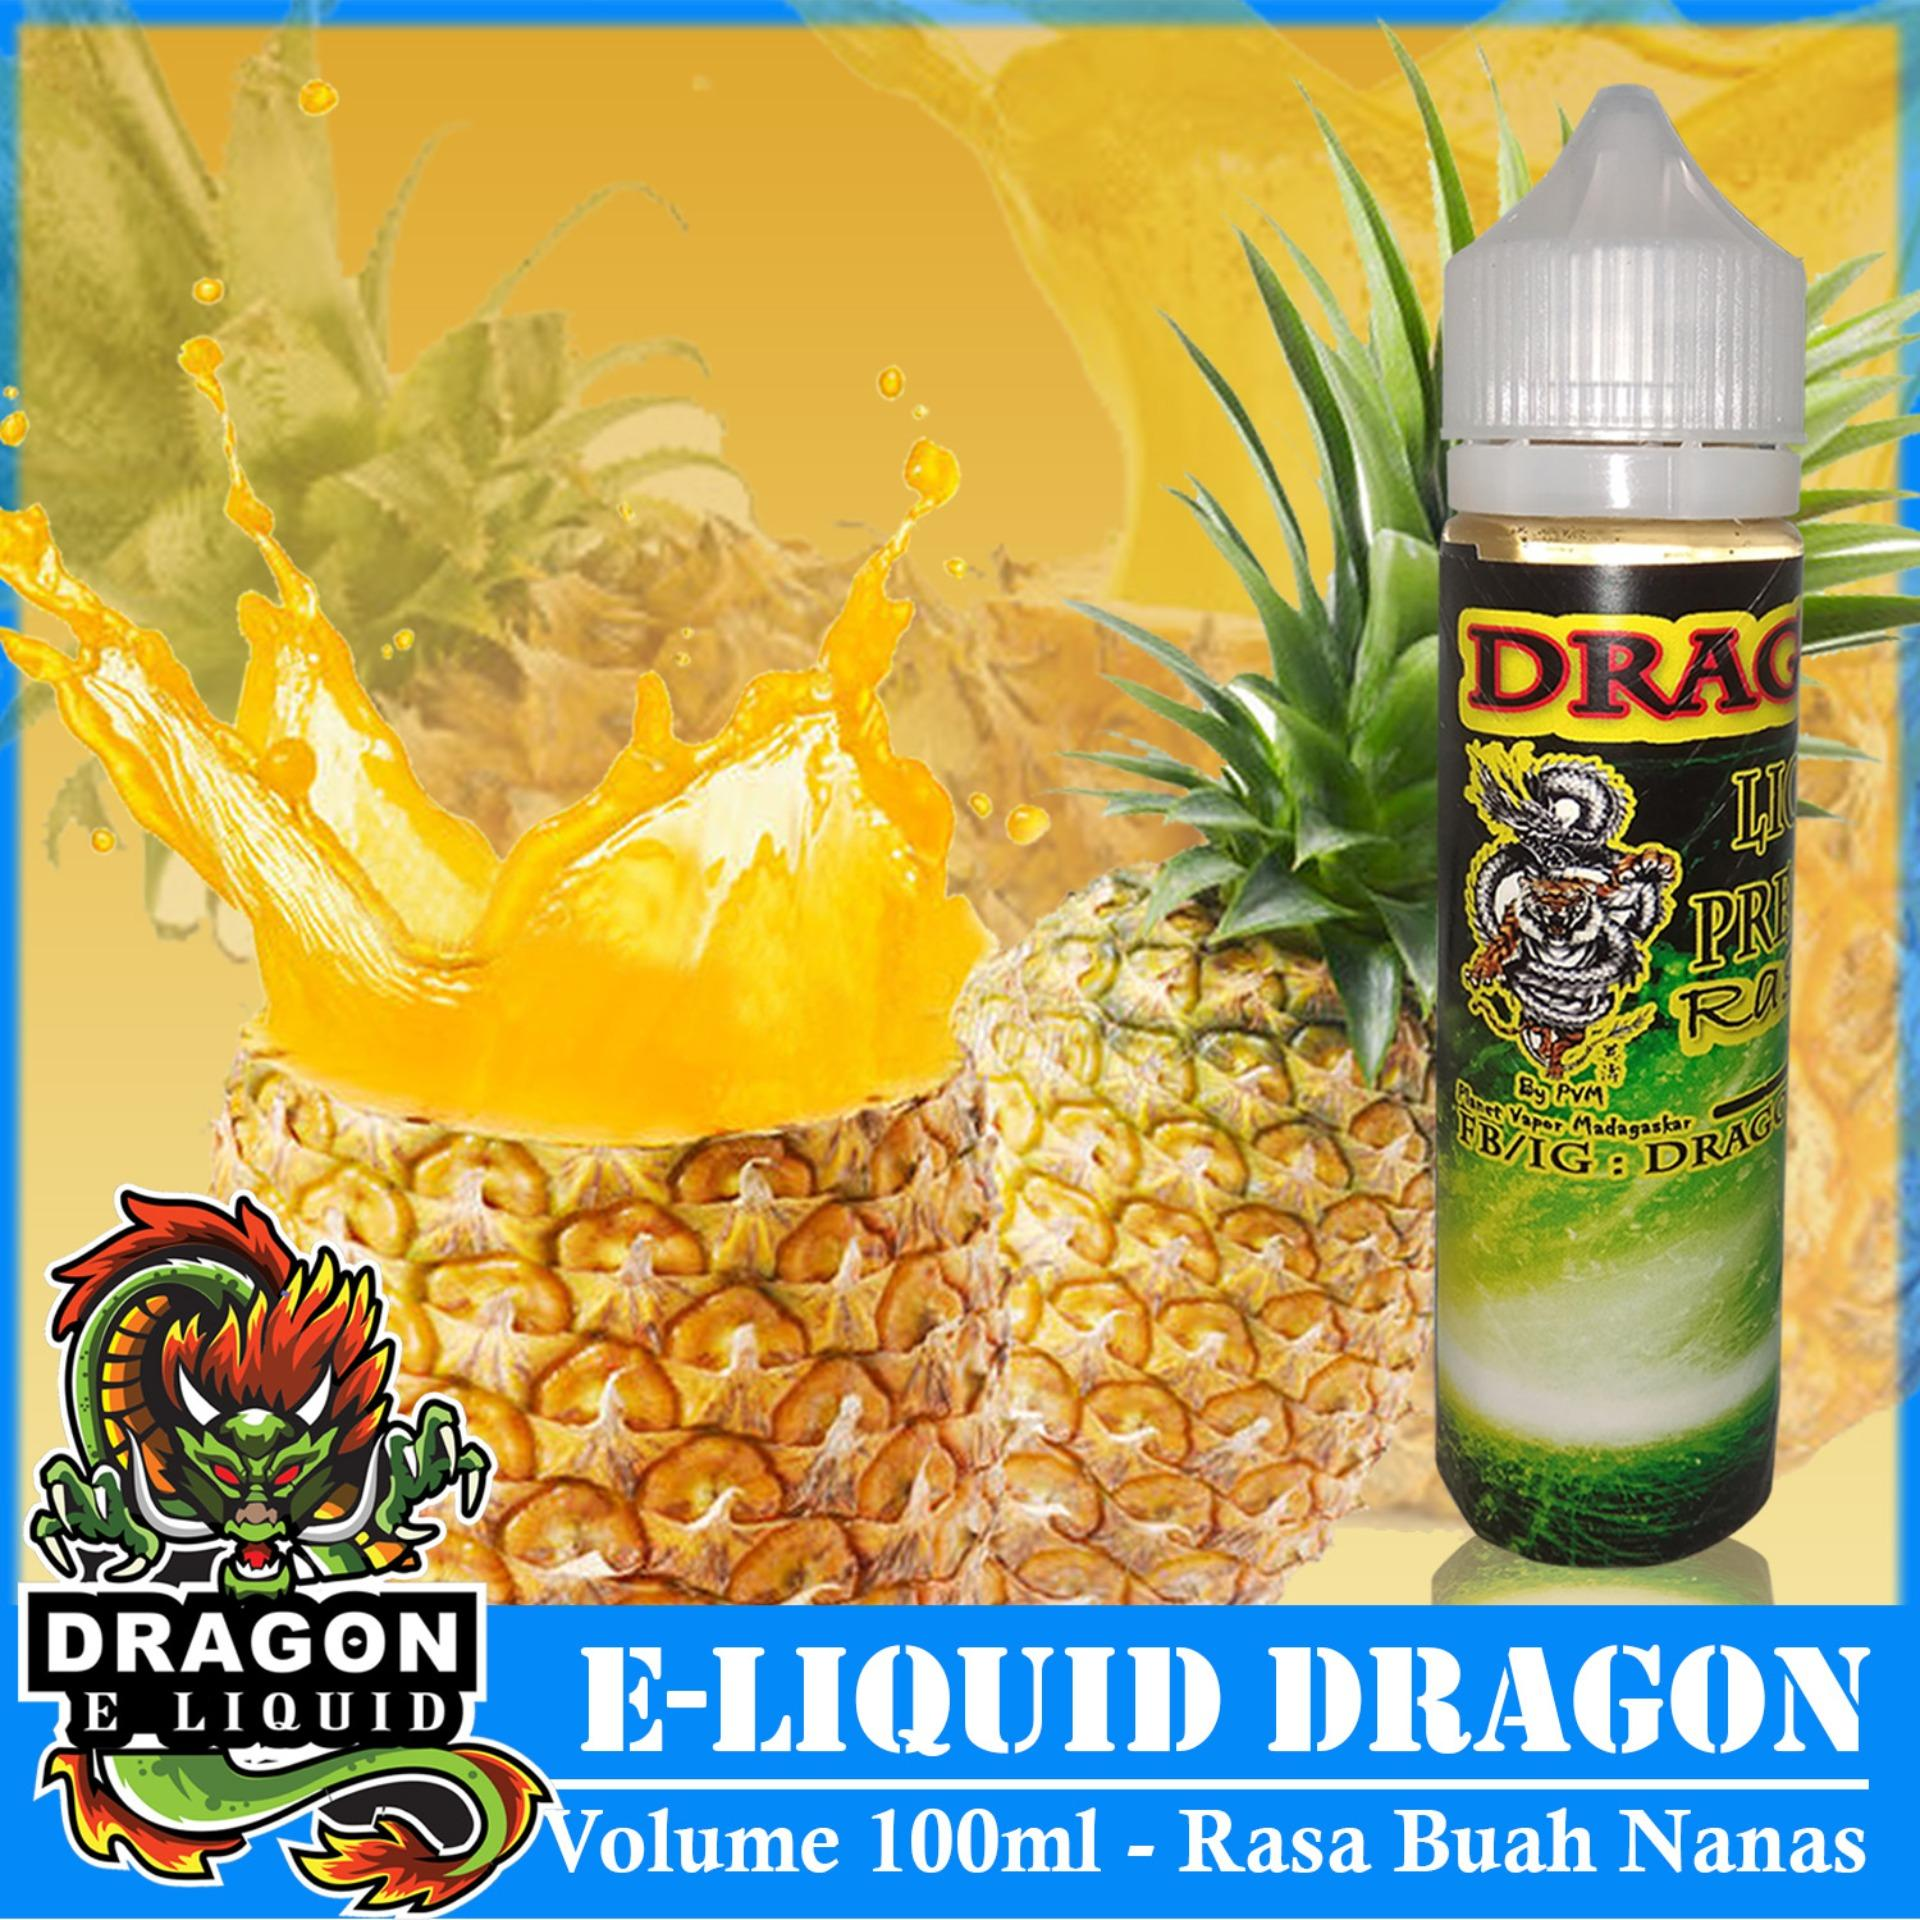 Top Premium Liquid Vapor Vape Vaporizer Mango Tropical Juice Fruity Ohmku Ptic 3mg 60 Ml Lokal Jm354 1 Dragon 60ml Rasa Nanas Free Tiger 5ml Random Rokok Elektrik